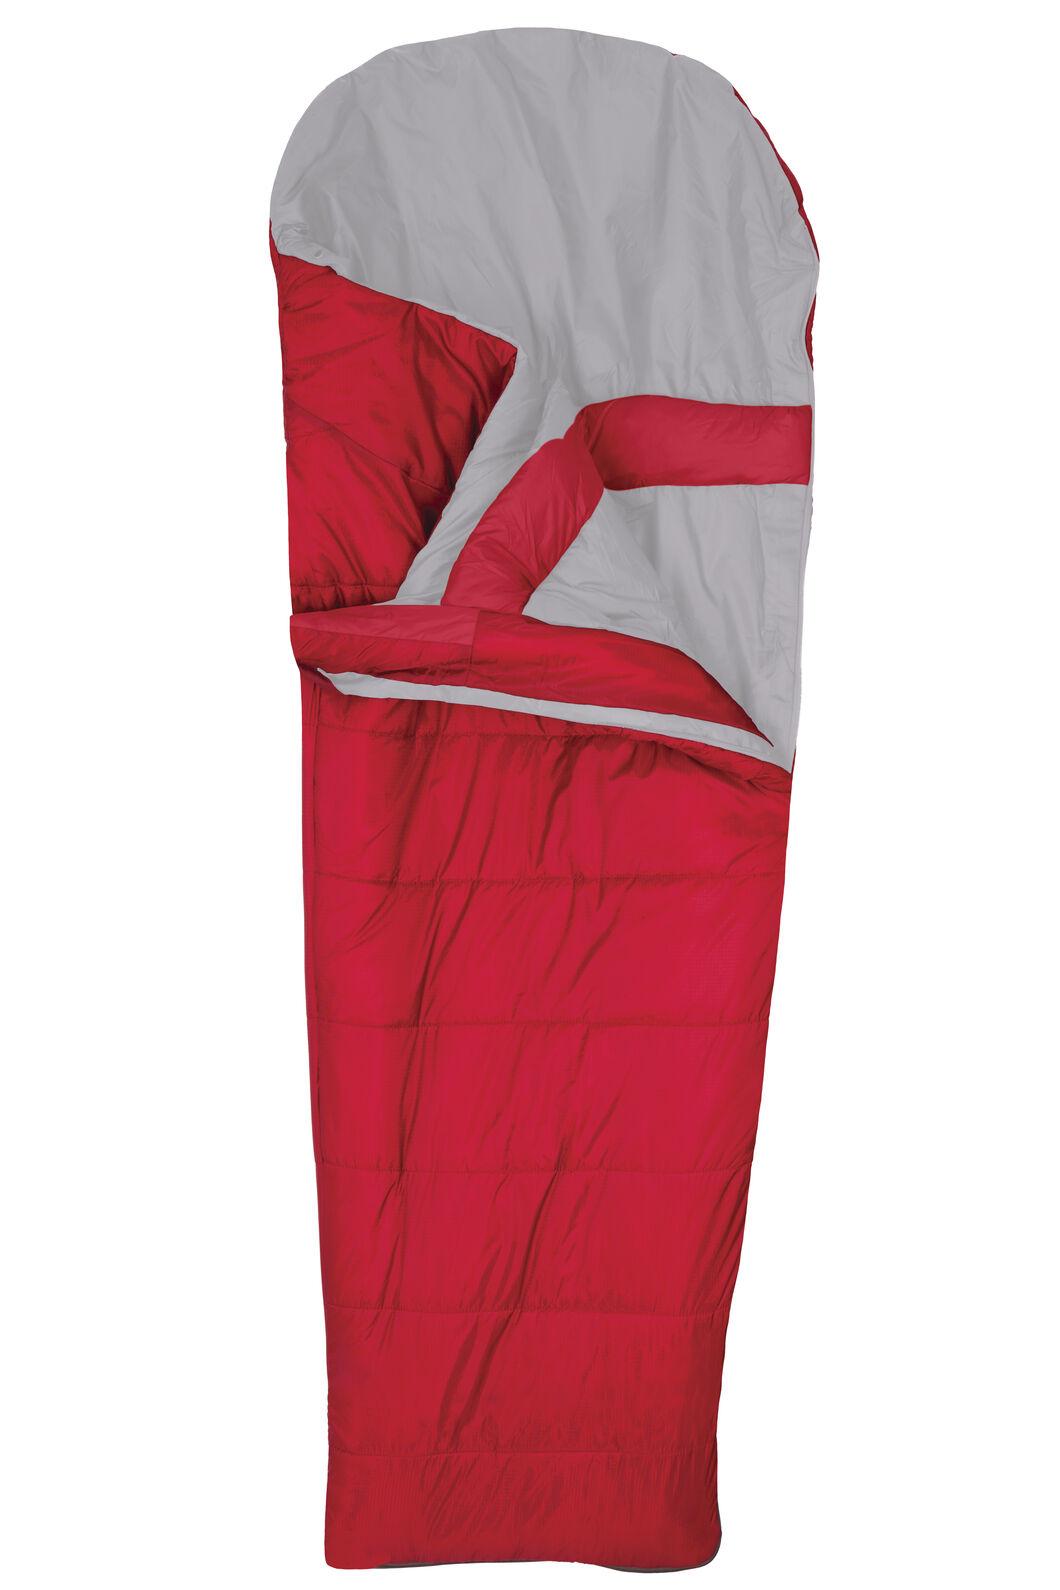 Roam Synthetic 350 Sleeping Bag - Standard, Crimson, hi-res